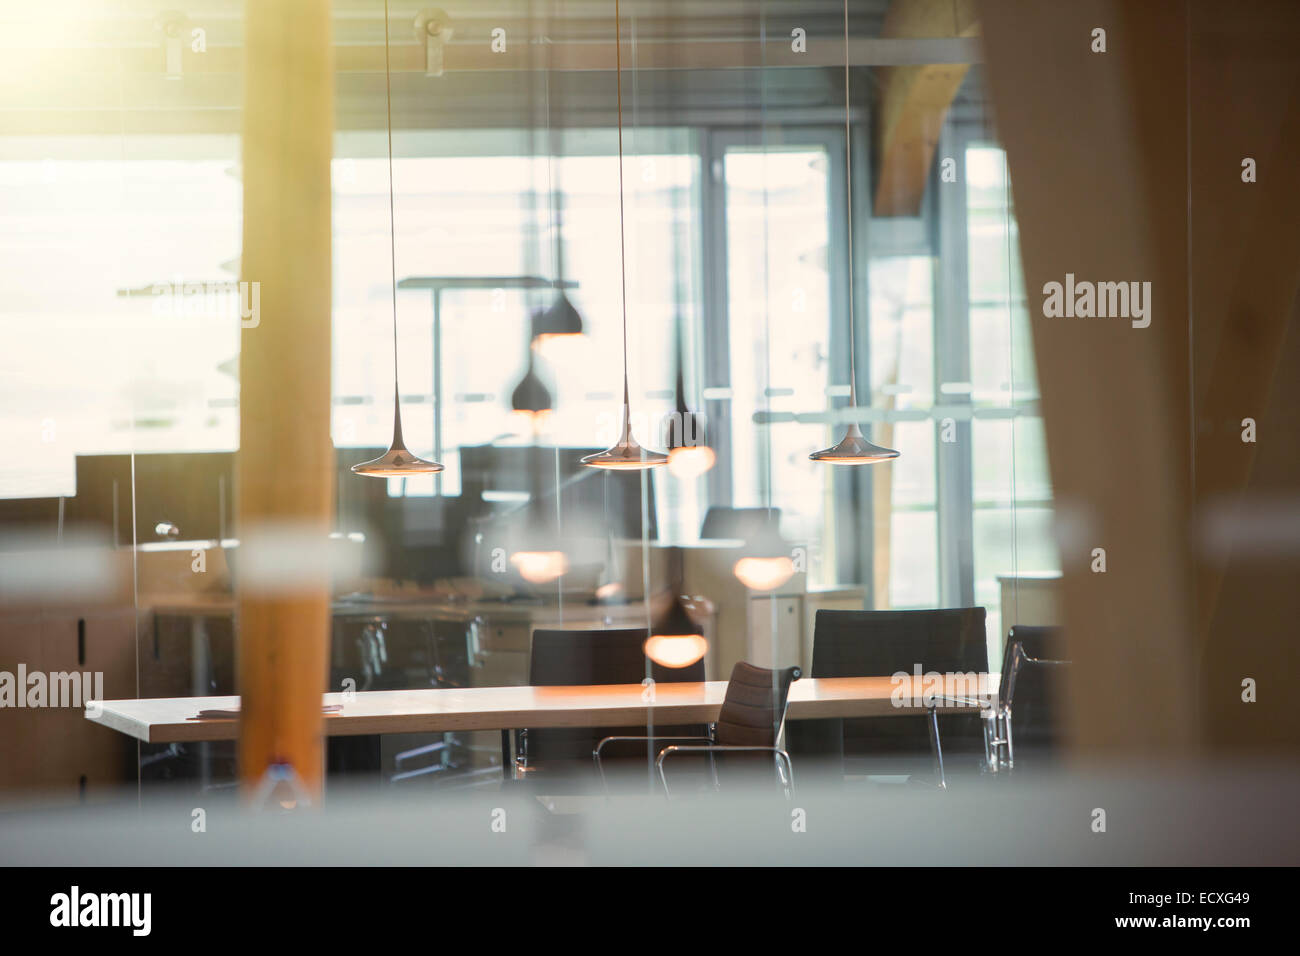 Light fixtures and desks in empty office - Stock Image